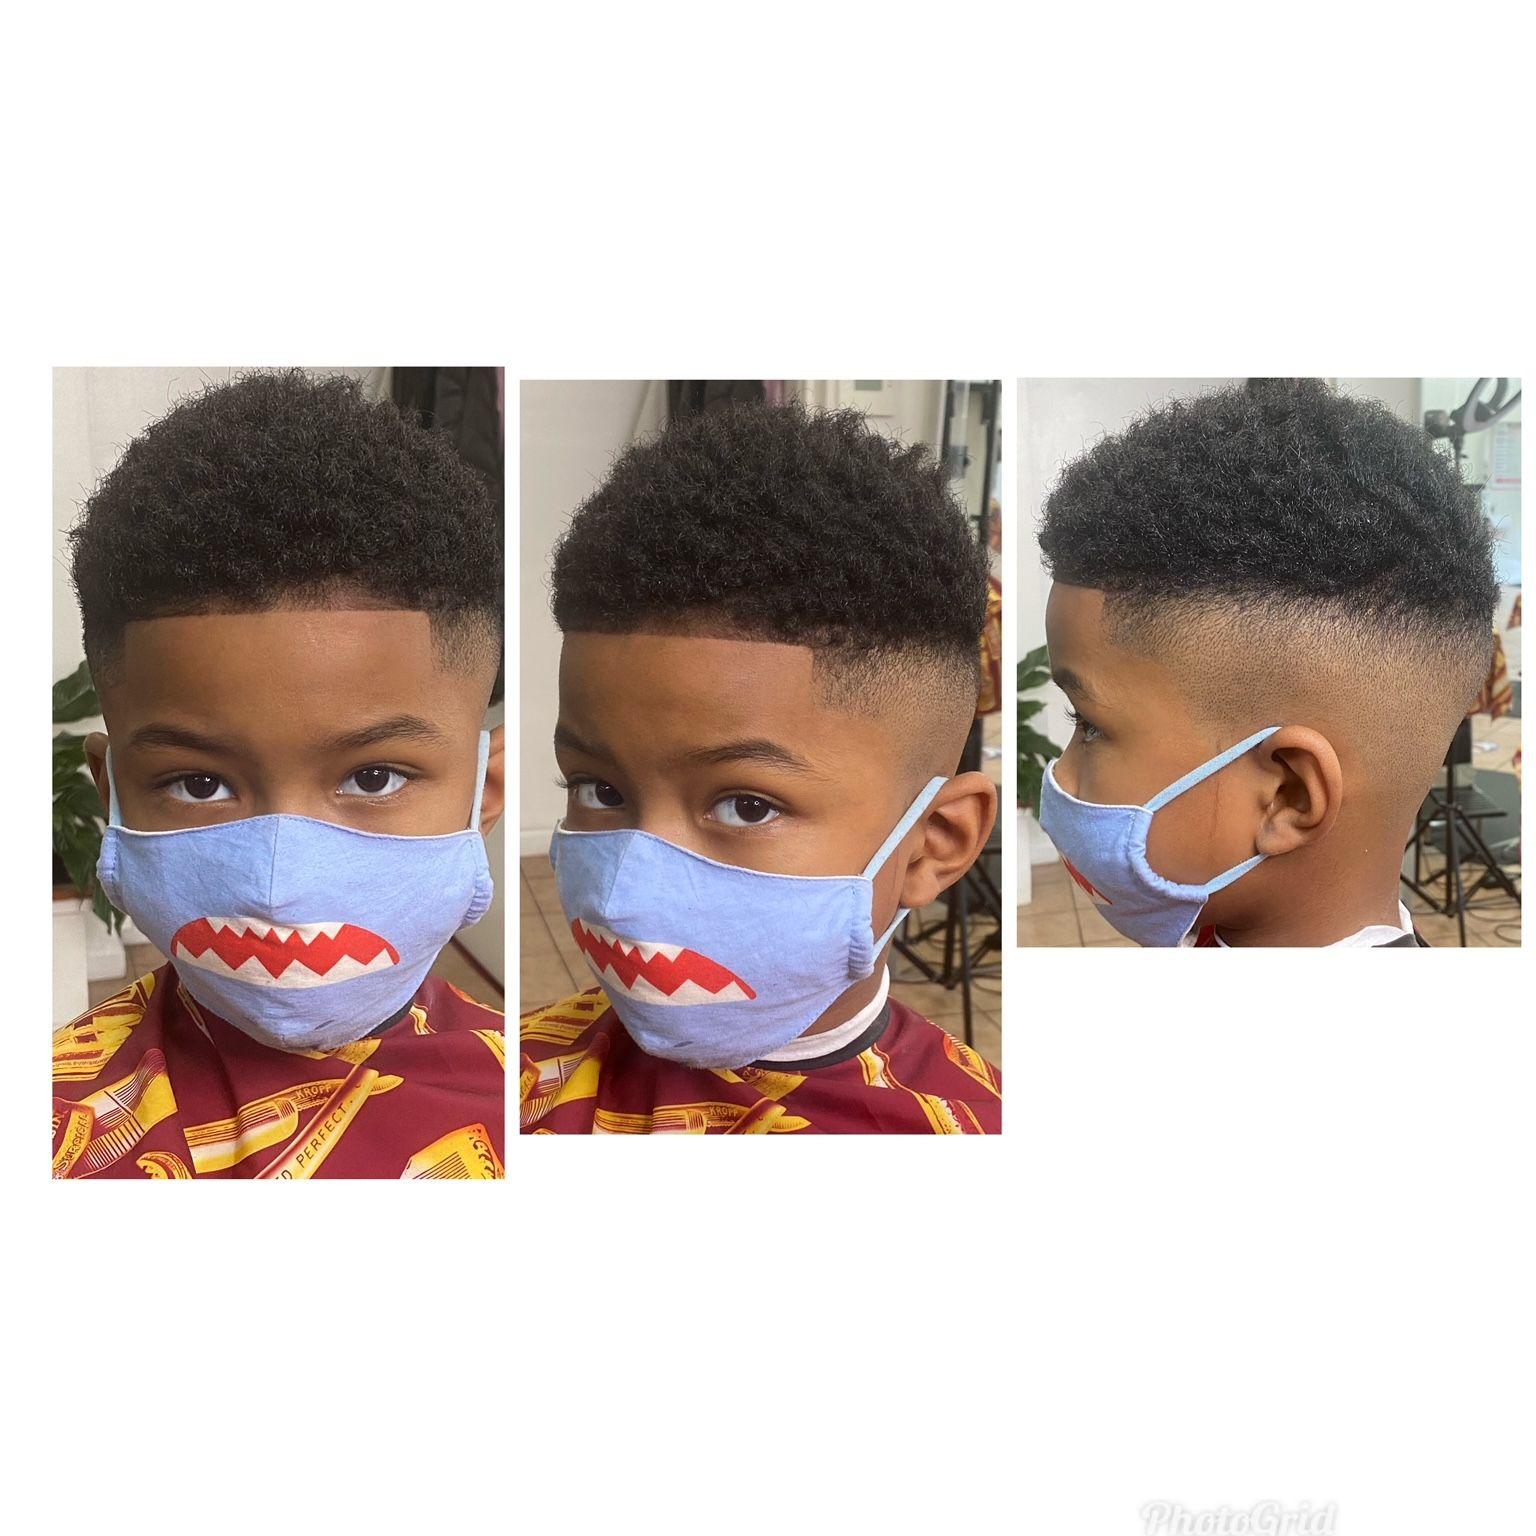 Triple LT Editionz Barber Lounge & Hair Salon